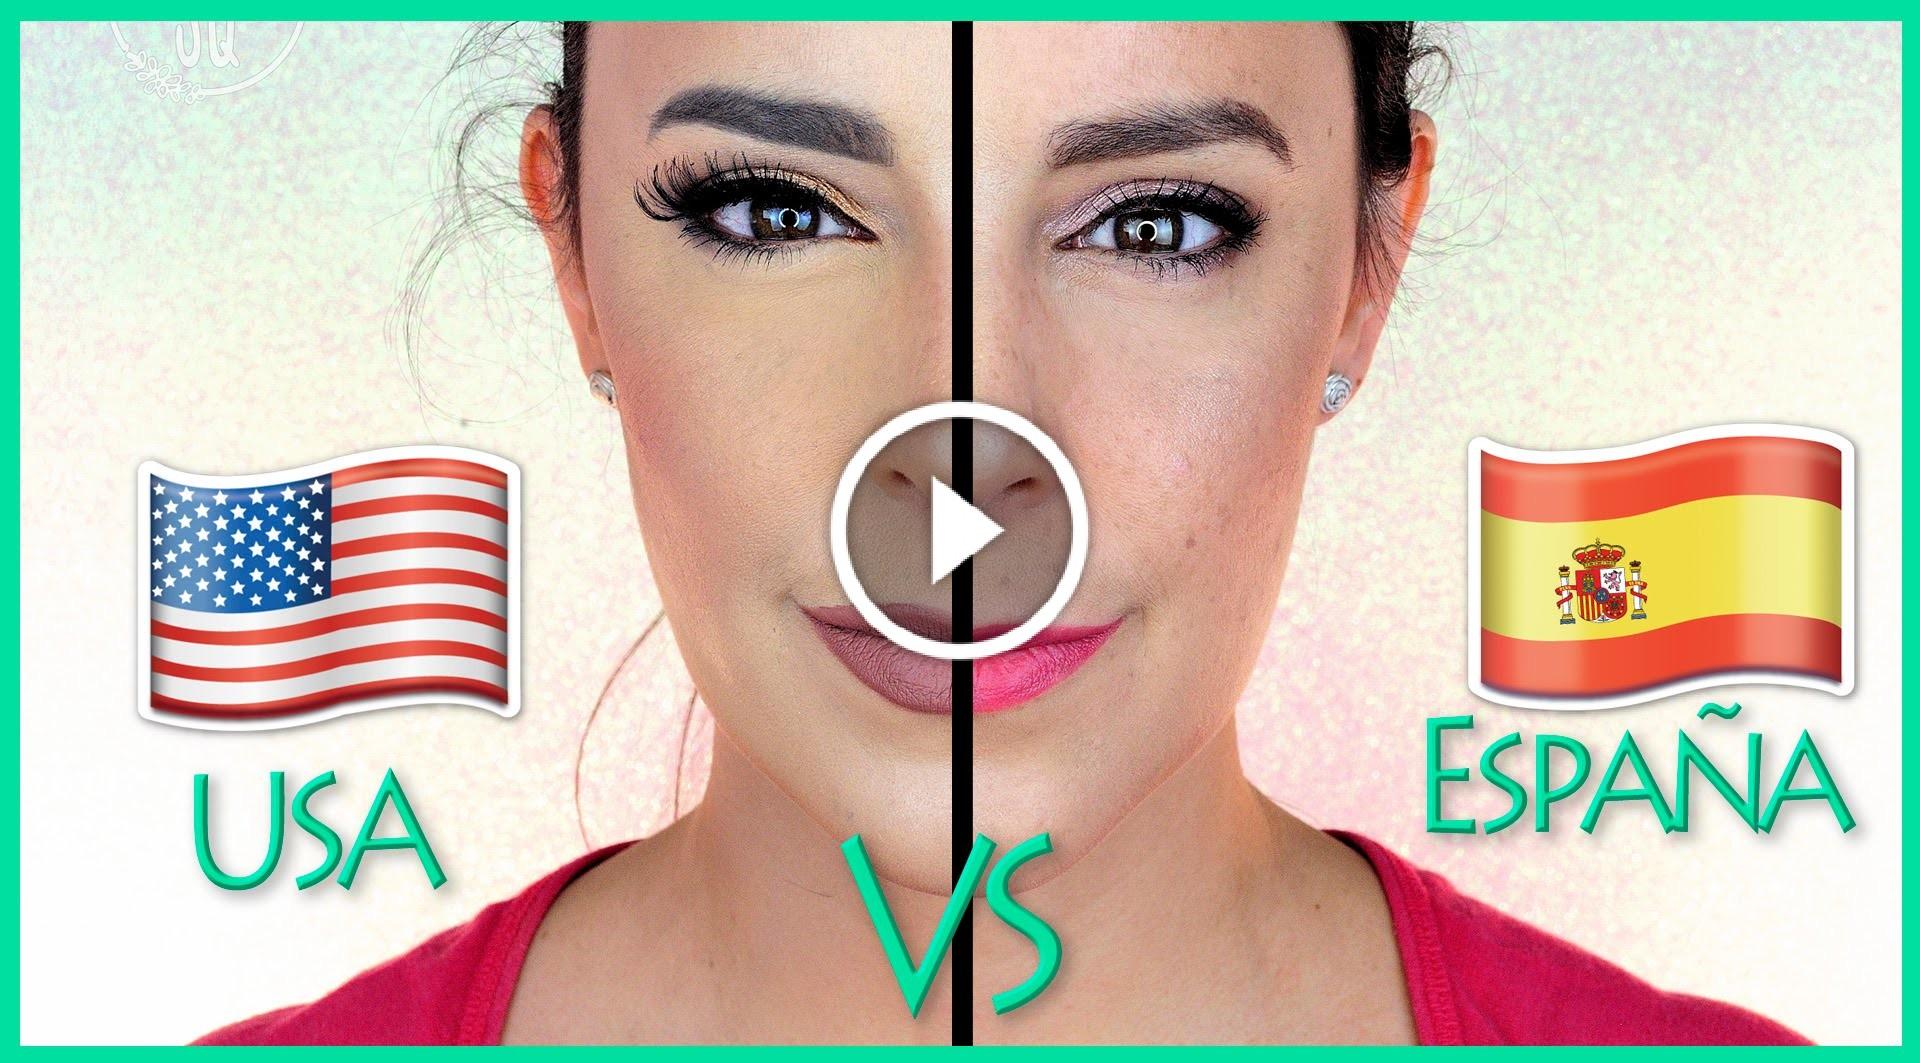 maquillaje usa vs españa